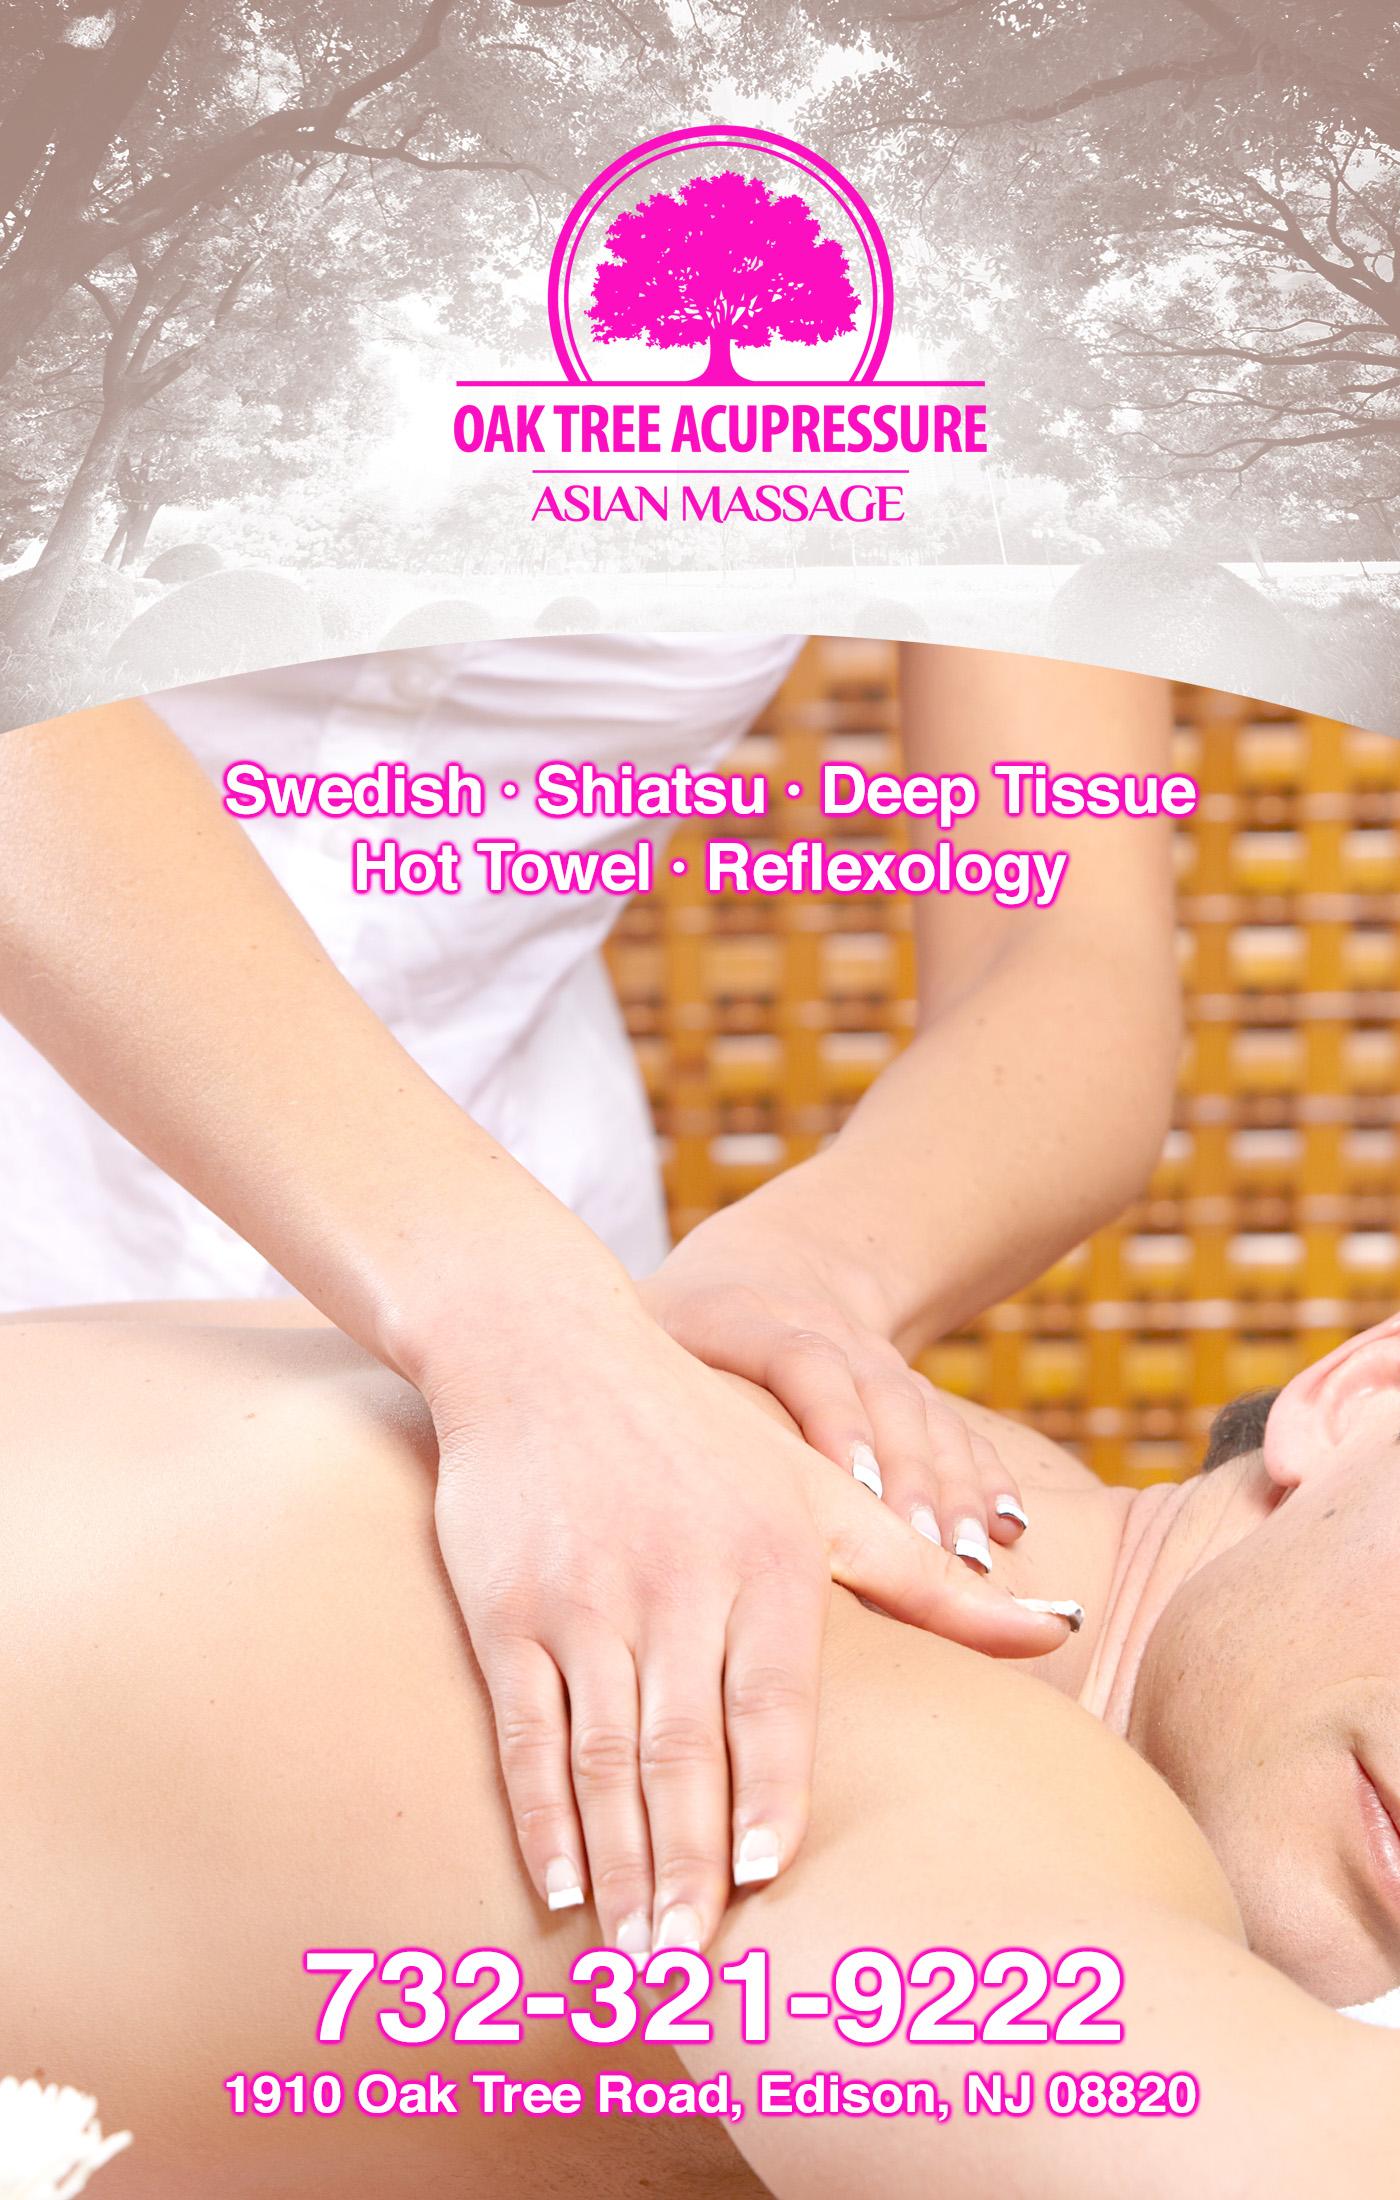 Massage Spa Local Search | OMGPAGE.COM | Oak Tree Acupressure